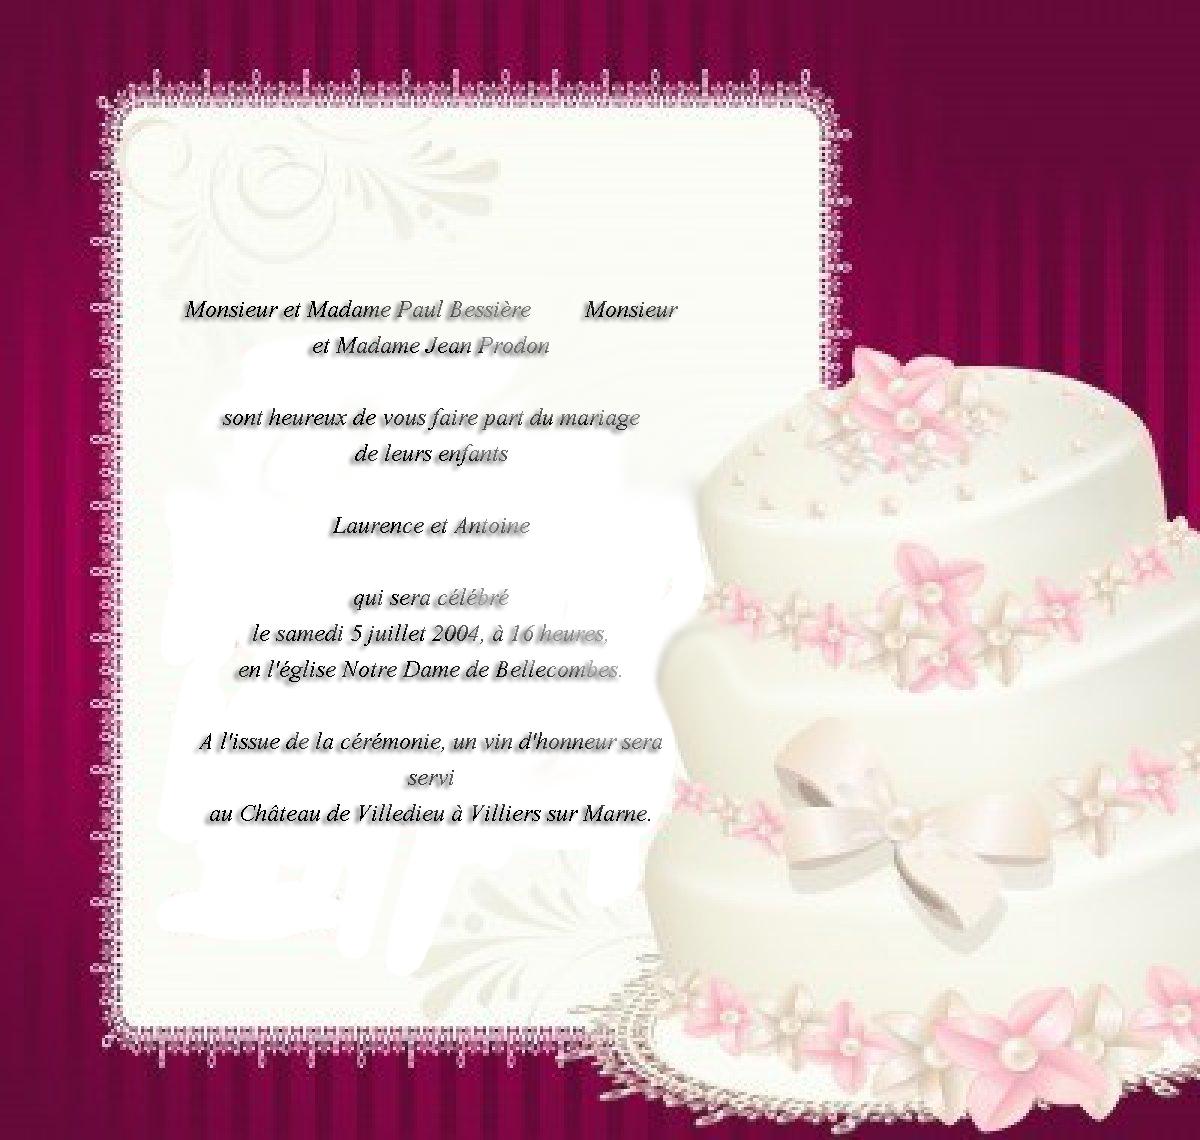 mai 2013 invitation mariage carte mariage texte. Black Bedroom Furniture Sets. Home Design Ideas